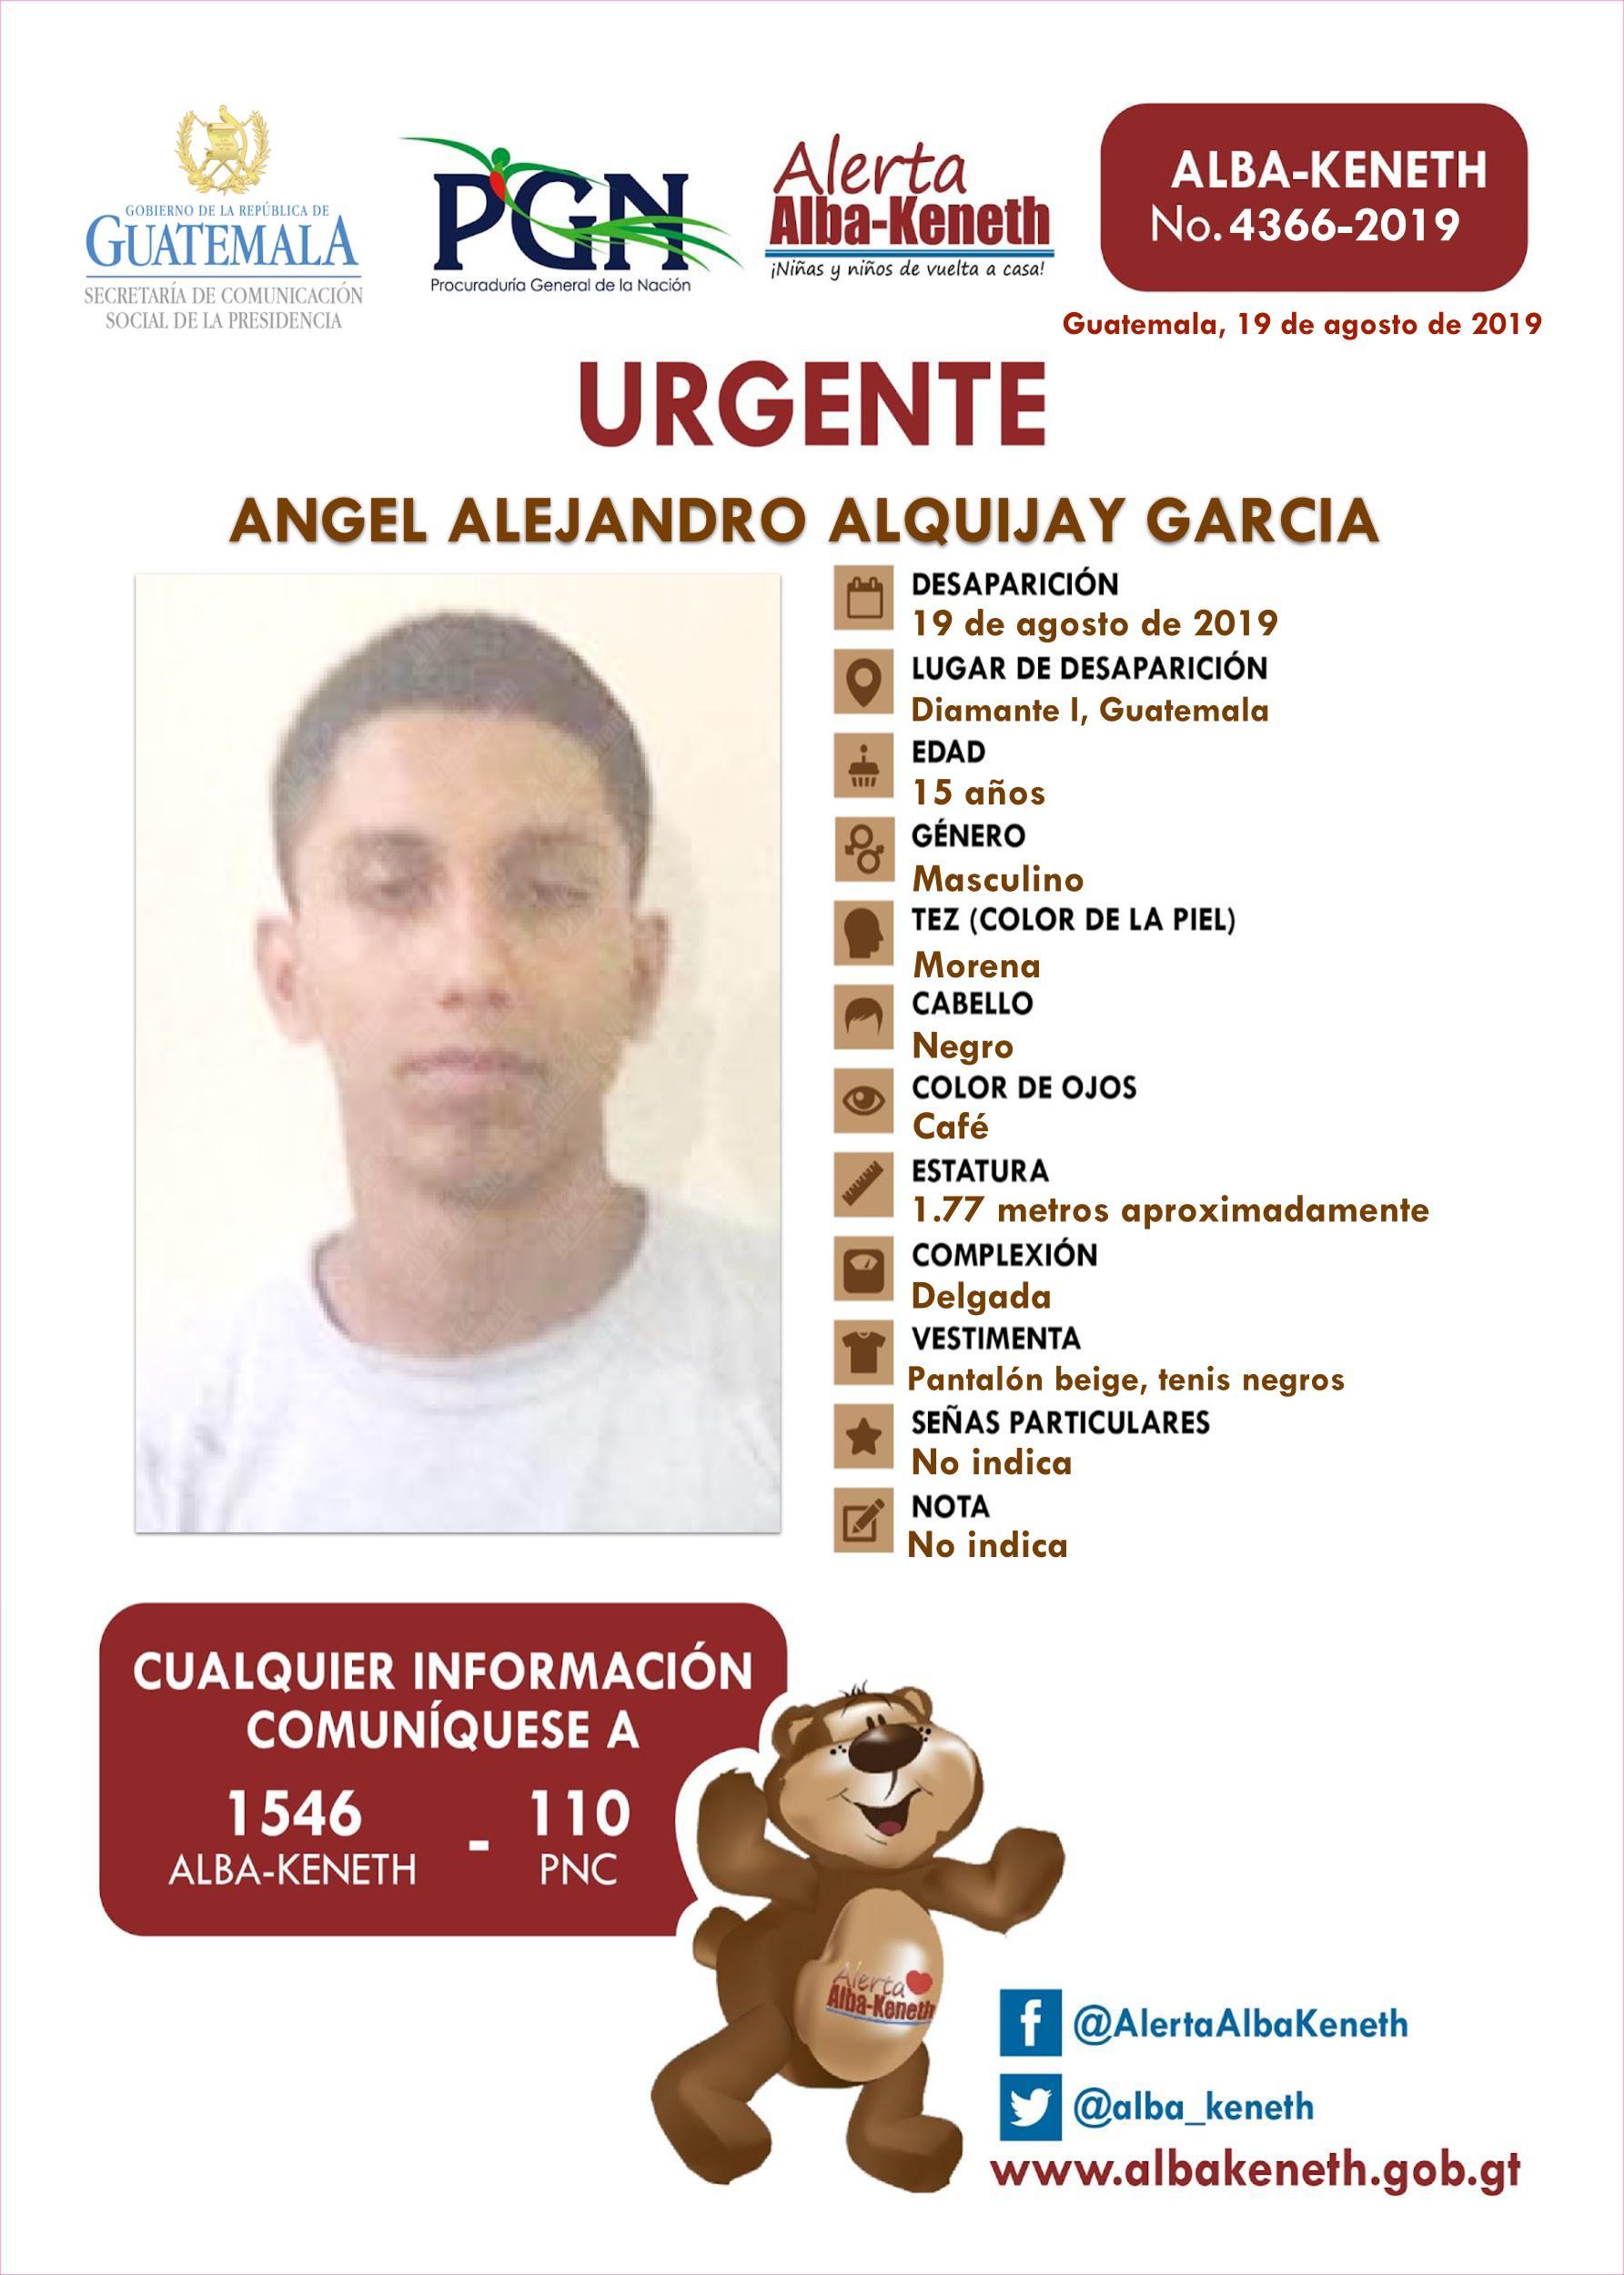 Angel Alejandro Alquijay Garcia